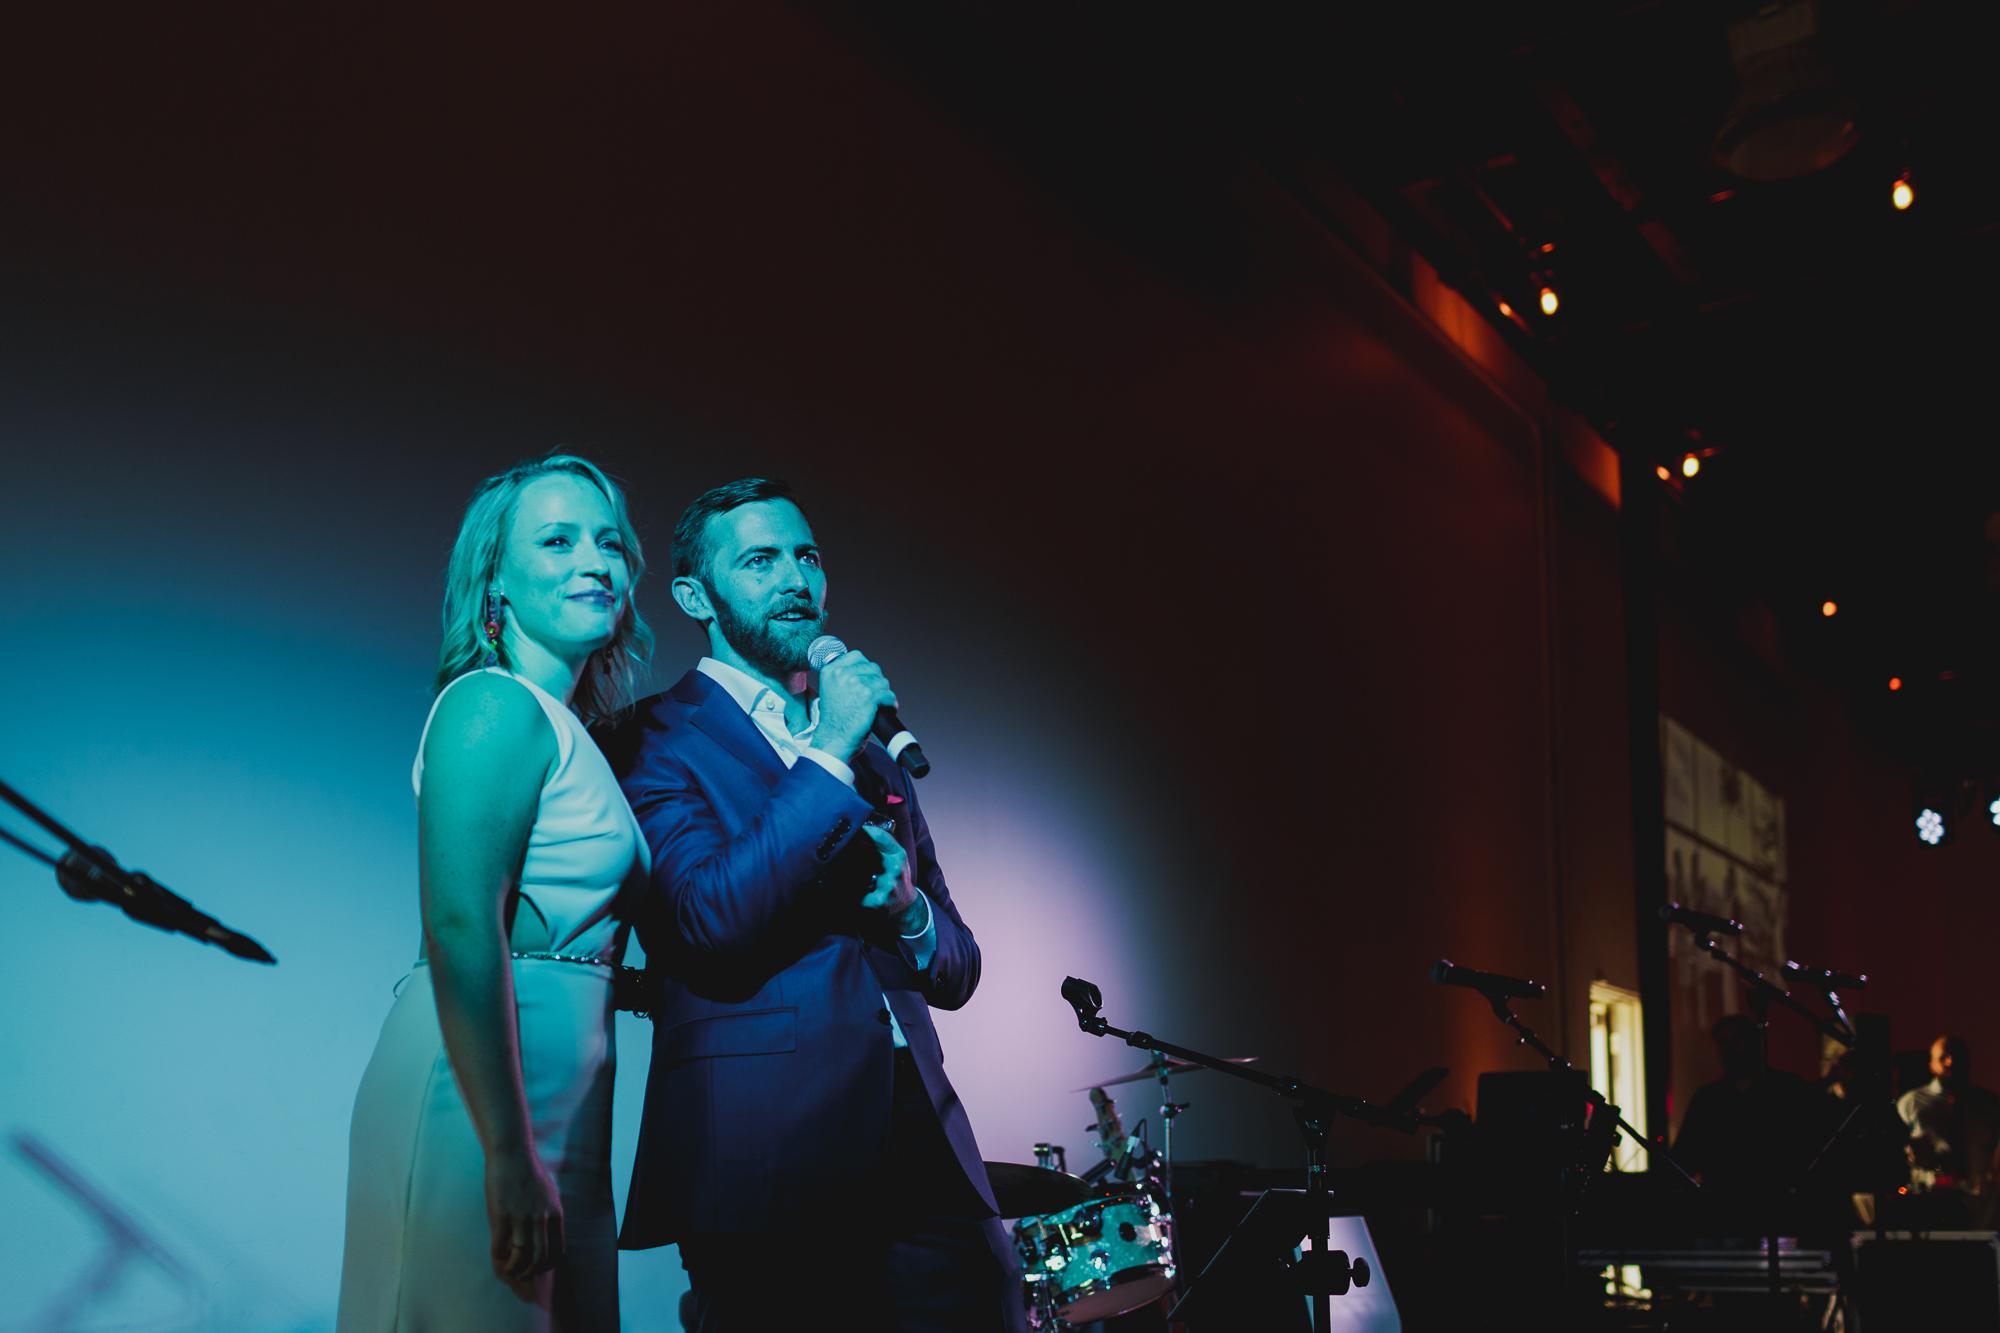 canvas event space wedding photos by Krista Welch-0081.jpg